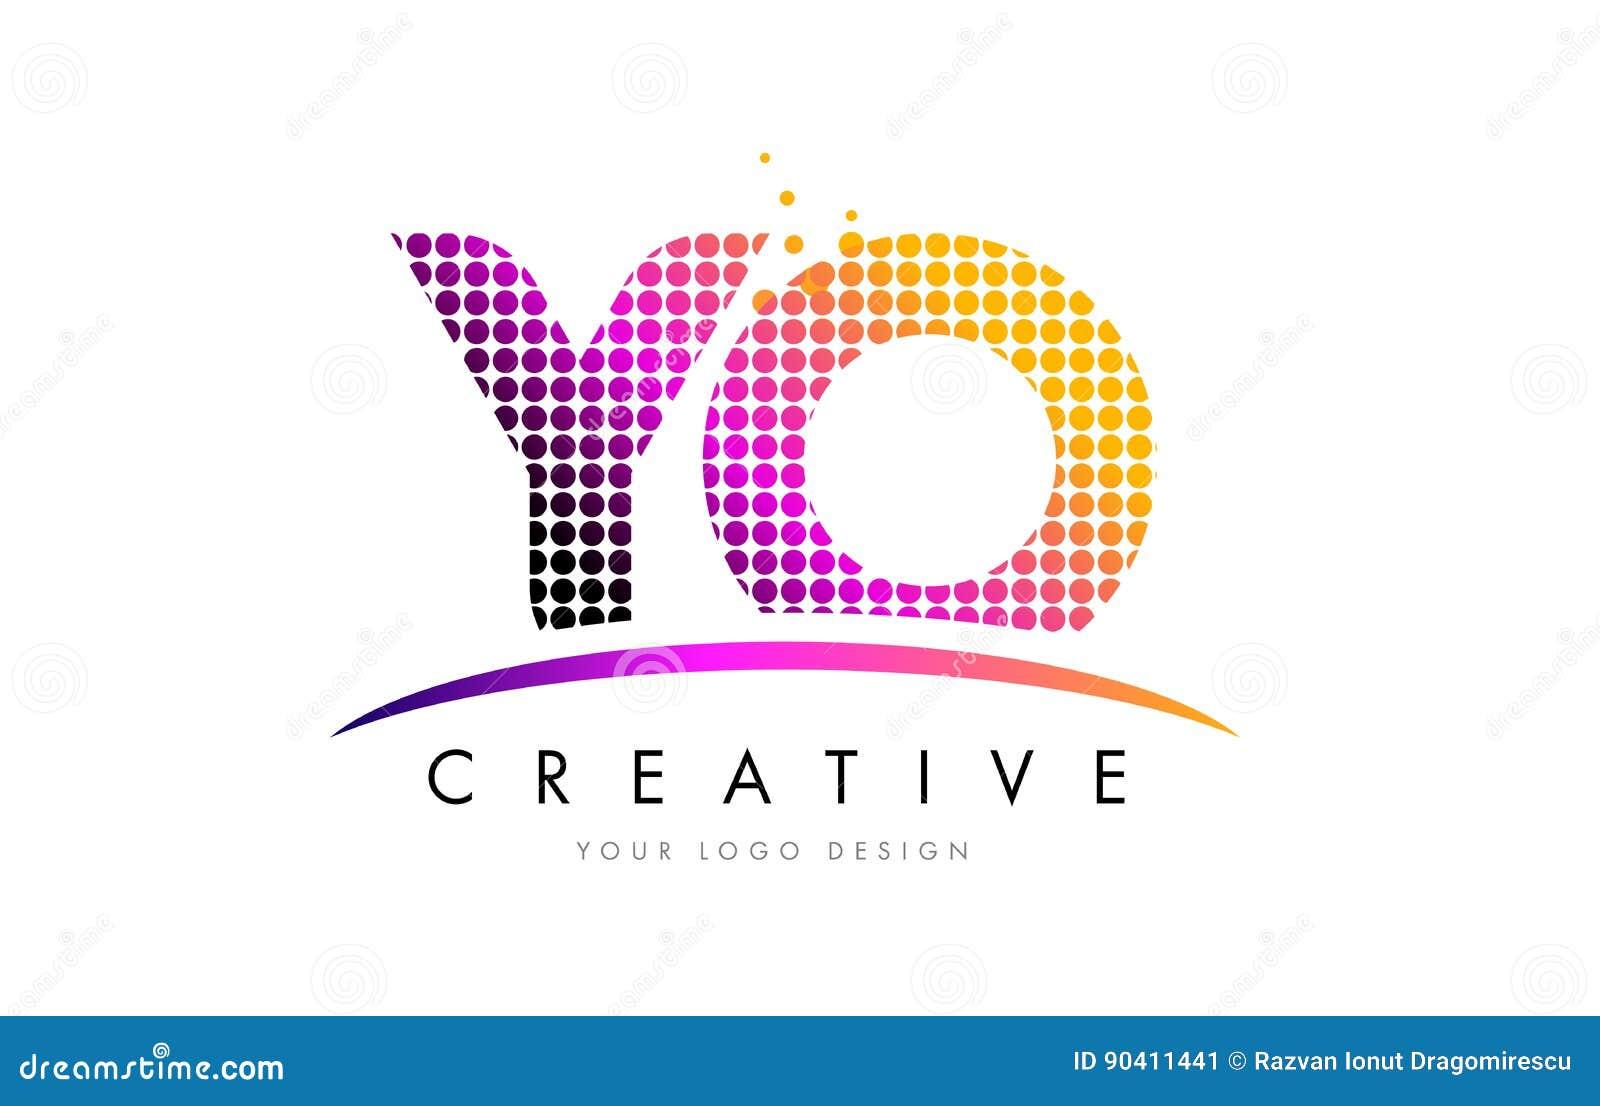 Yo y o letter logo design with magenta dots and swoosh stock yo y o letter logo design with magenta dots and swoosh buycottarizona Images